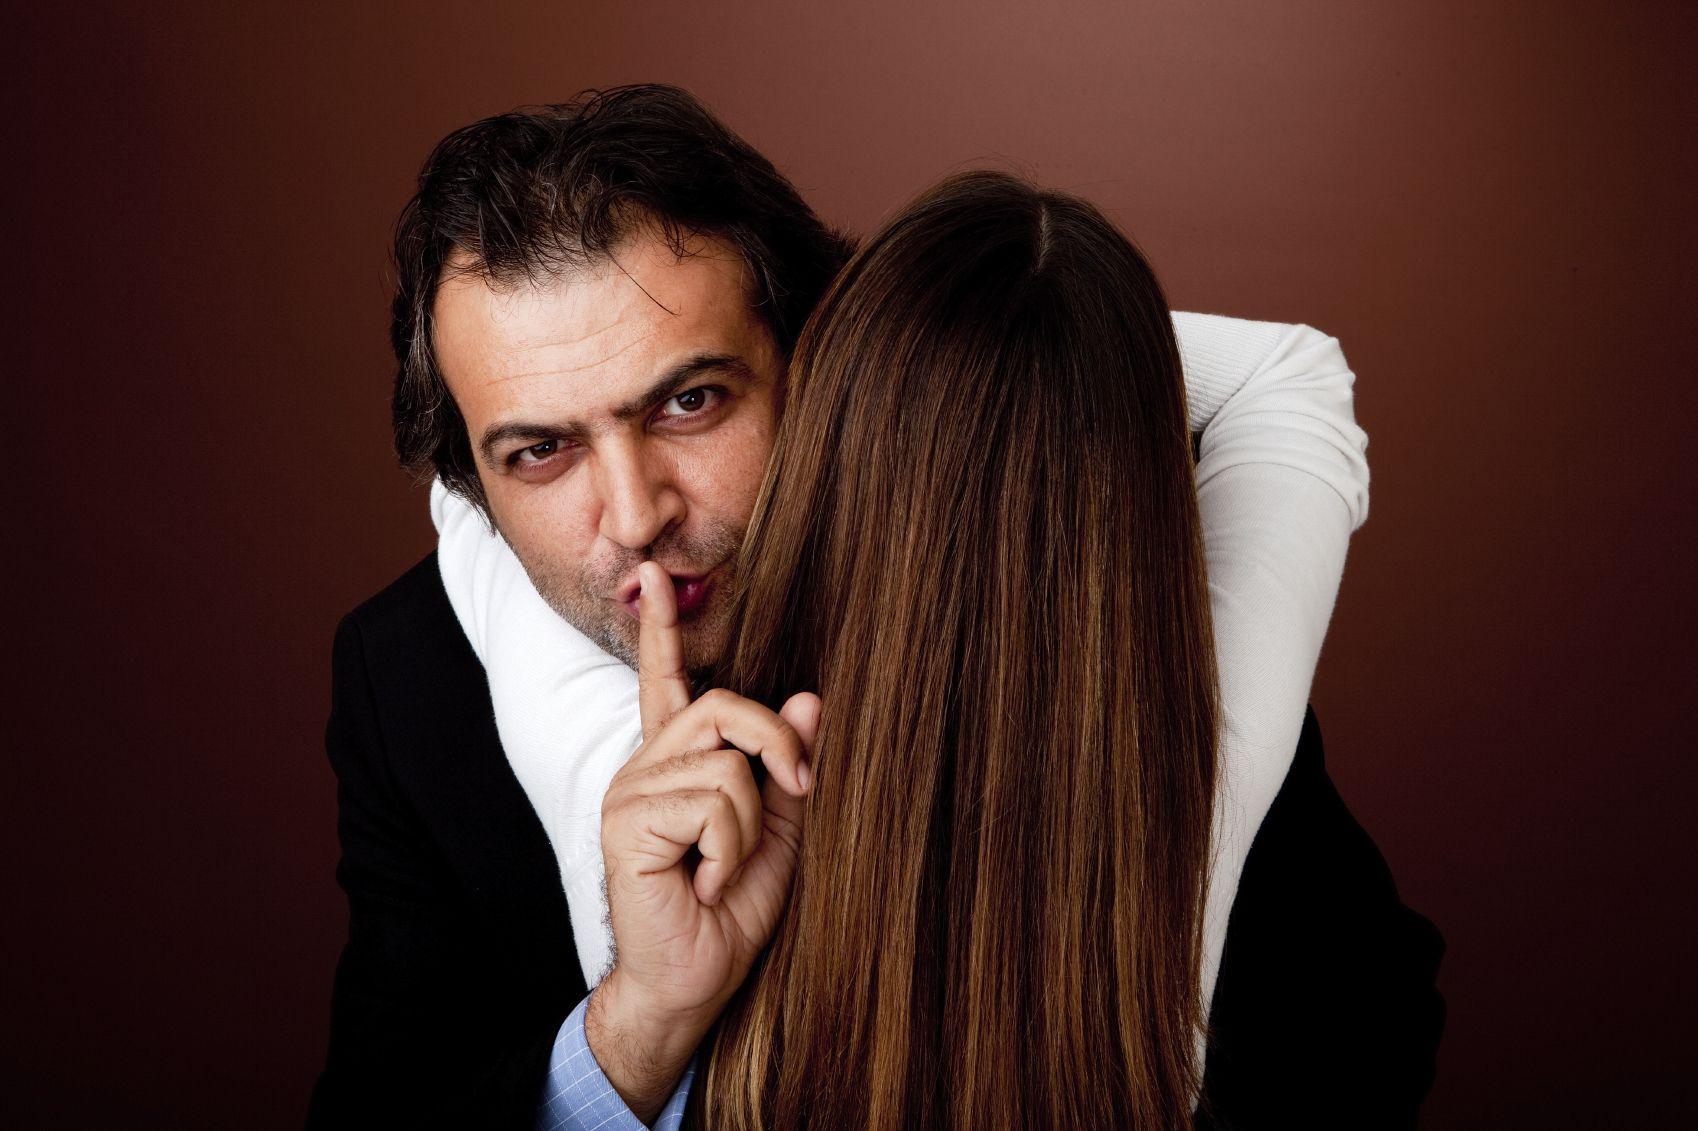 https://youtu.be/DRTC5nK7Cec | Cheating men, Infidelity